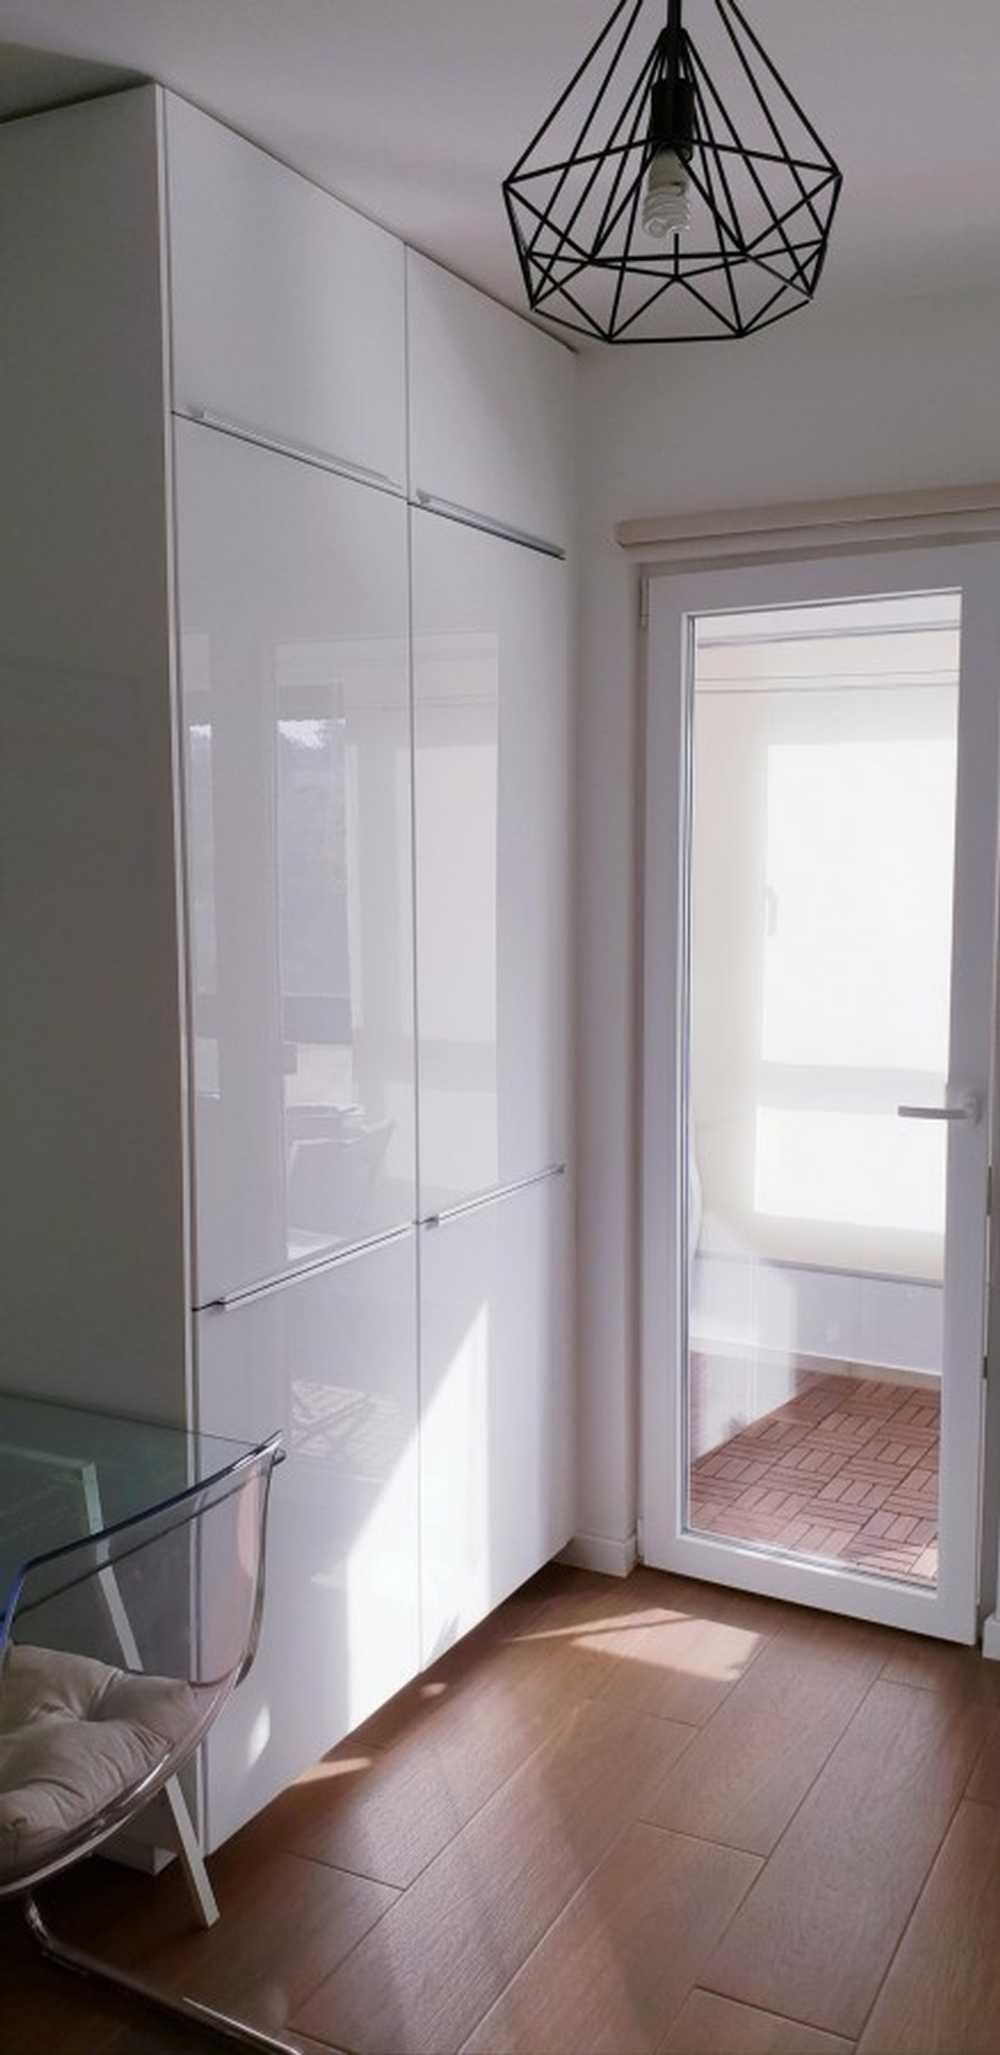 Póvoa de Lila Valpaços 公寓 照片 #request.properties.id#